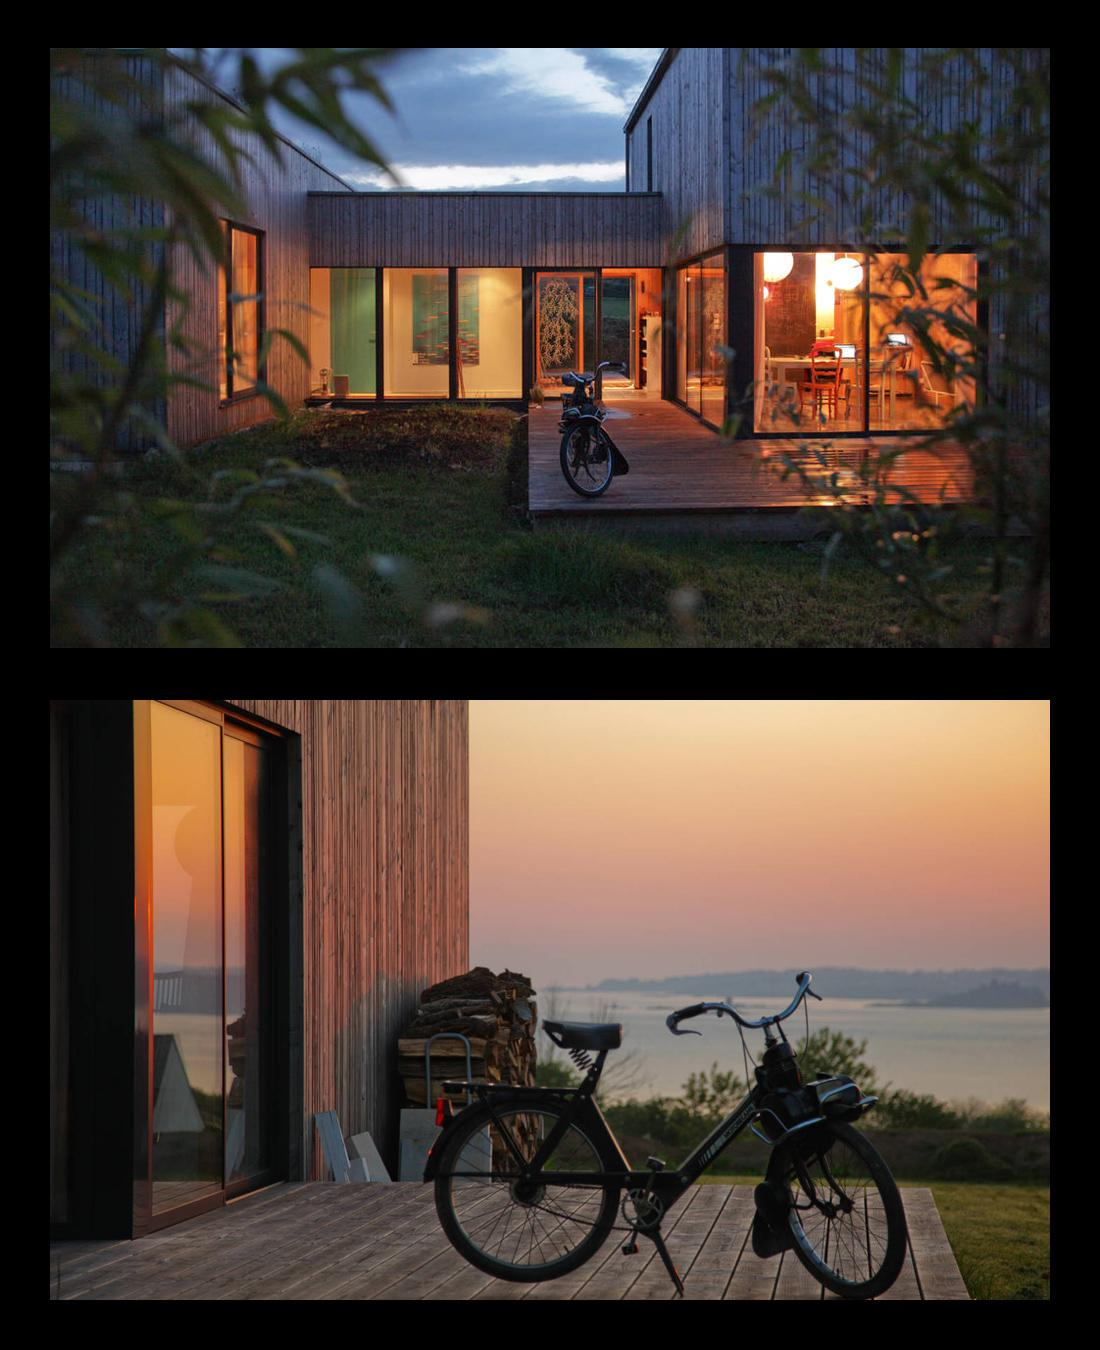 week ends en france 15 locations insolites rep r es sur airbnb le figaro madame. Black Bedroom Furniture Sets. Home Design Ideas